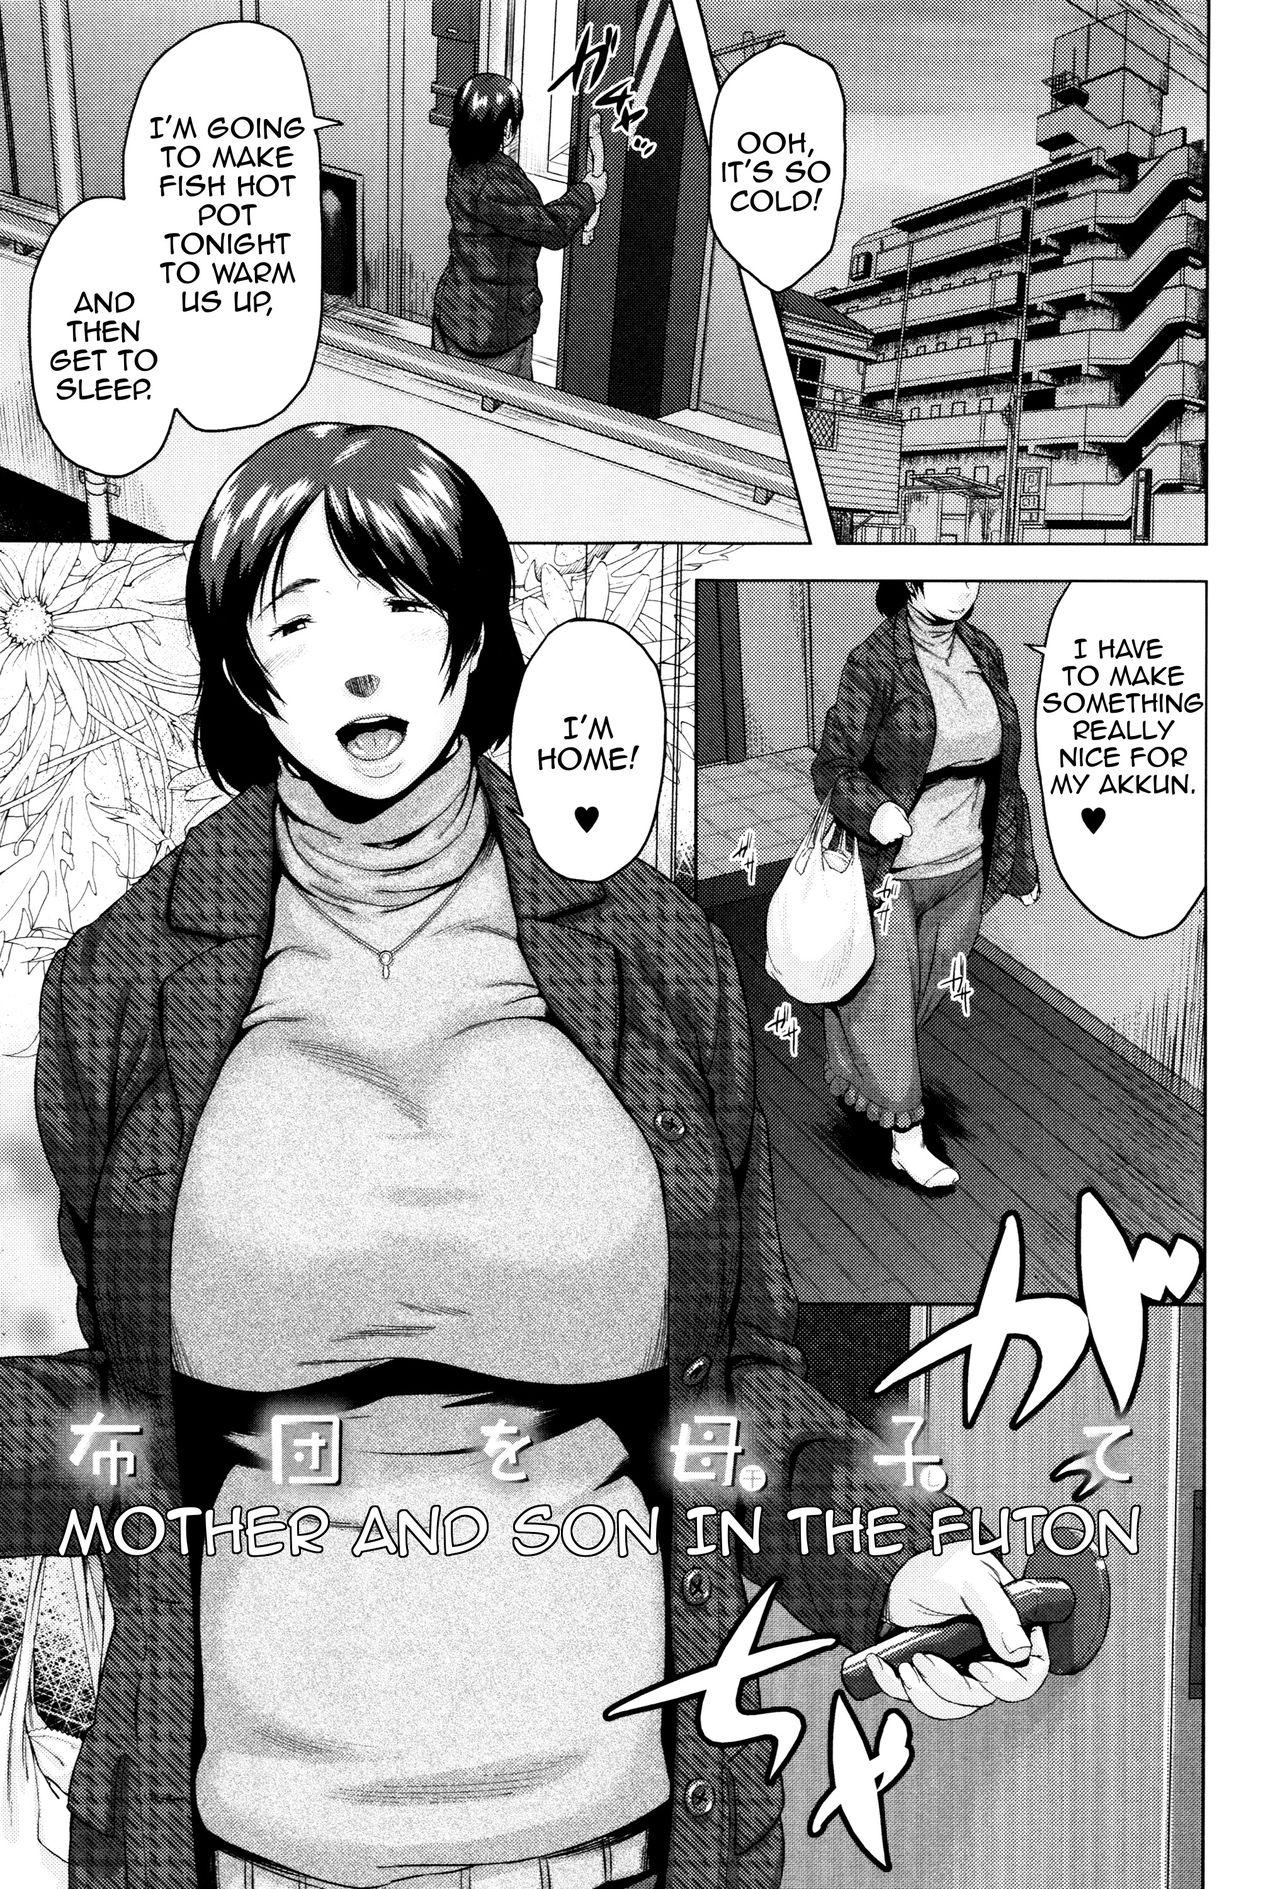 [Jitsuma] Kinyoubi no Haha-tachi e - To Friday's mothers [English] [Amoskandy, desudesu, Kusanyagi] 39